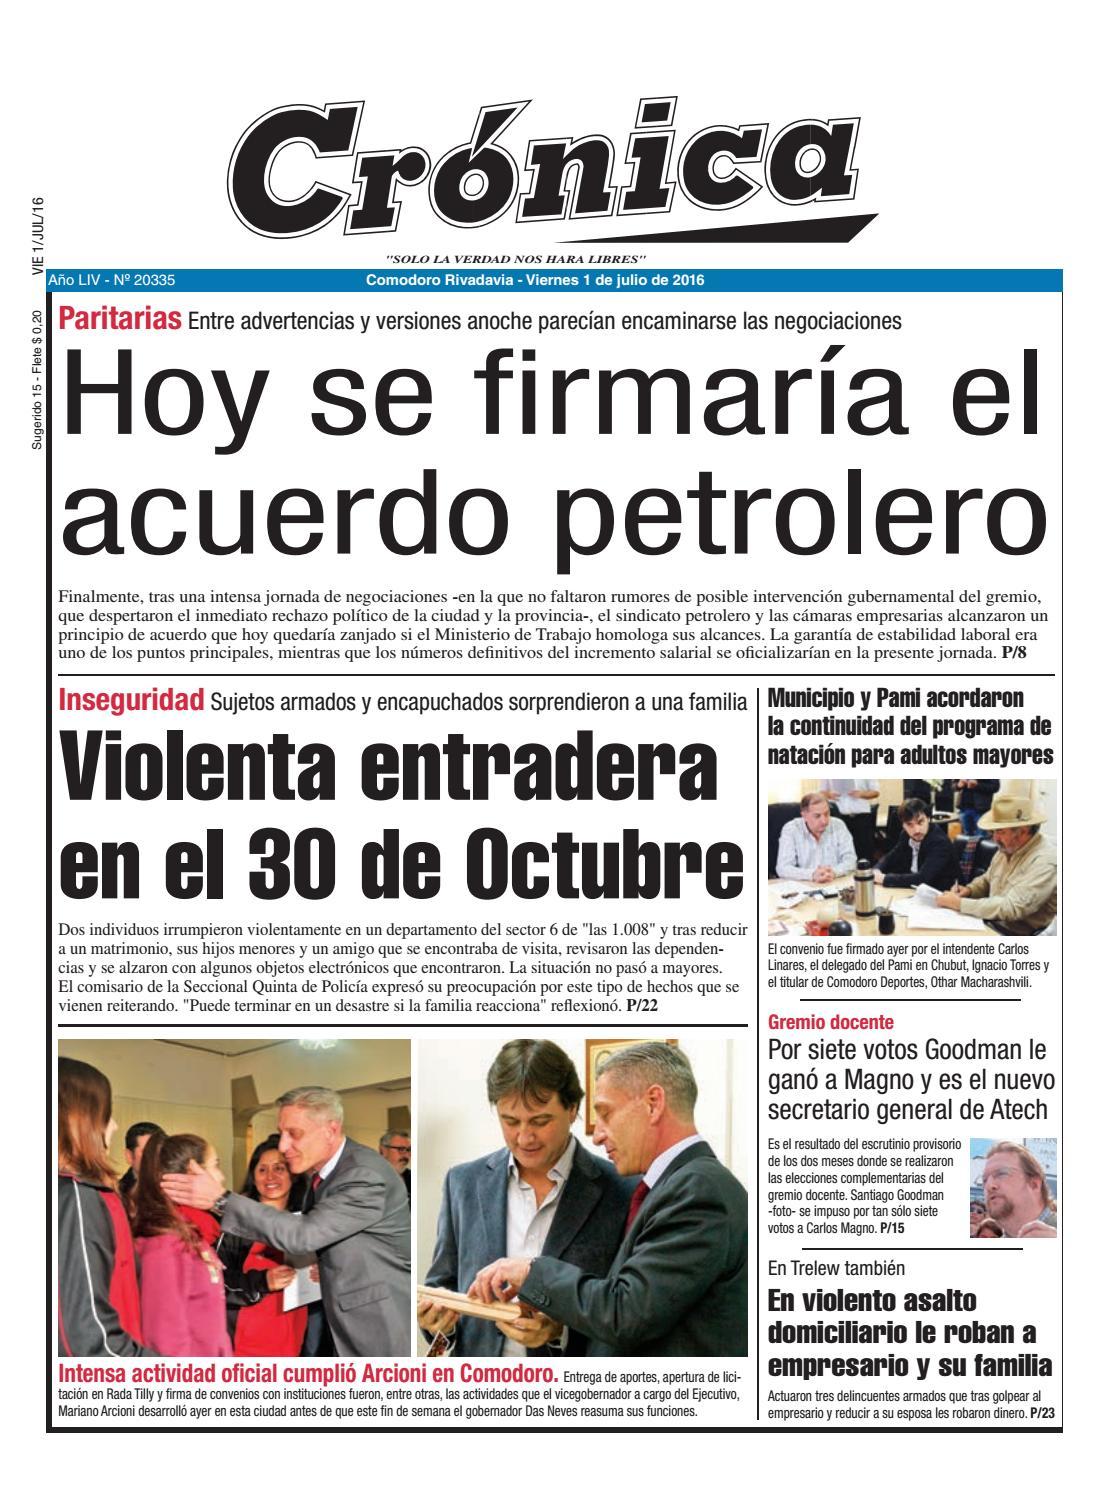 8ee7fd815fd0b14734571ec9c0457cce by Diario Crónica - issuu d09824ec294c